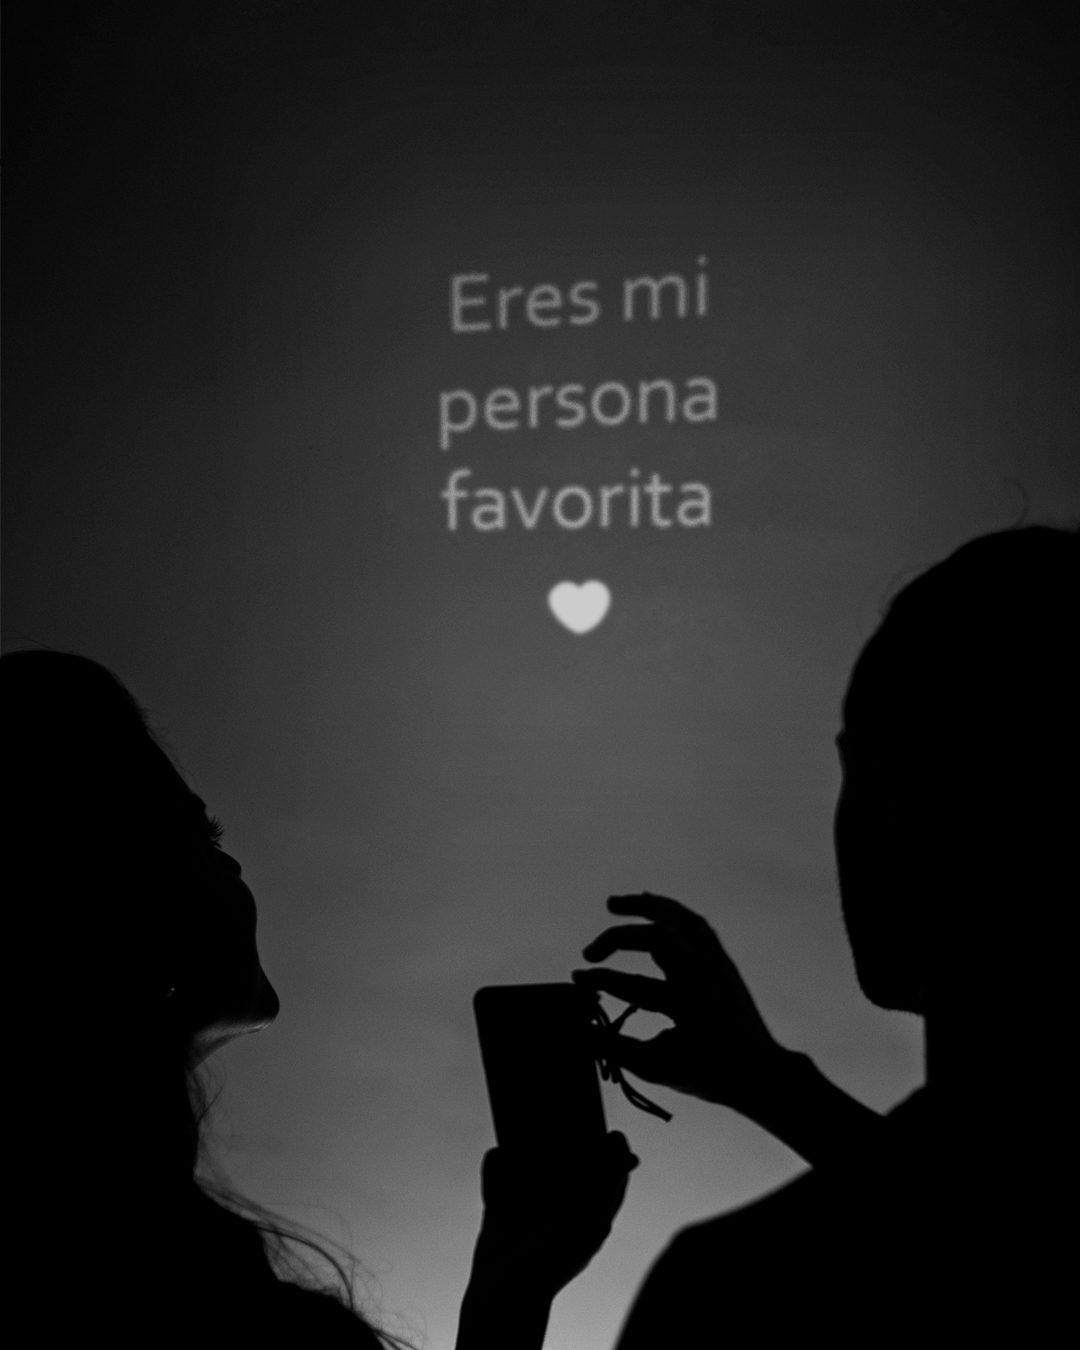 Eres mi persona favorita1